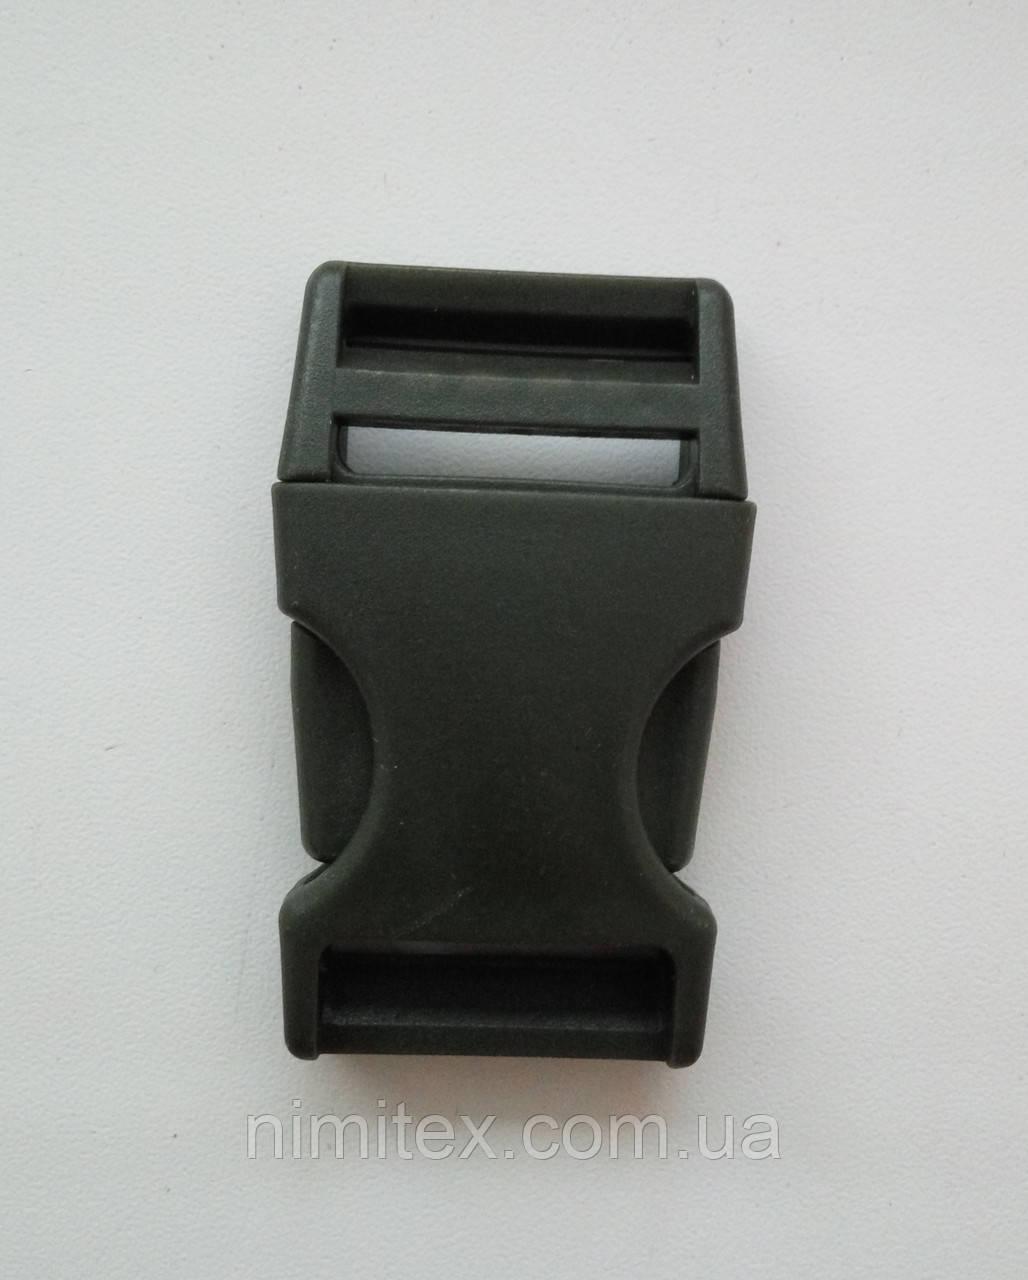 Фастекс 25 мм хаки